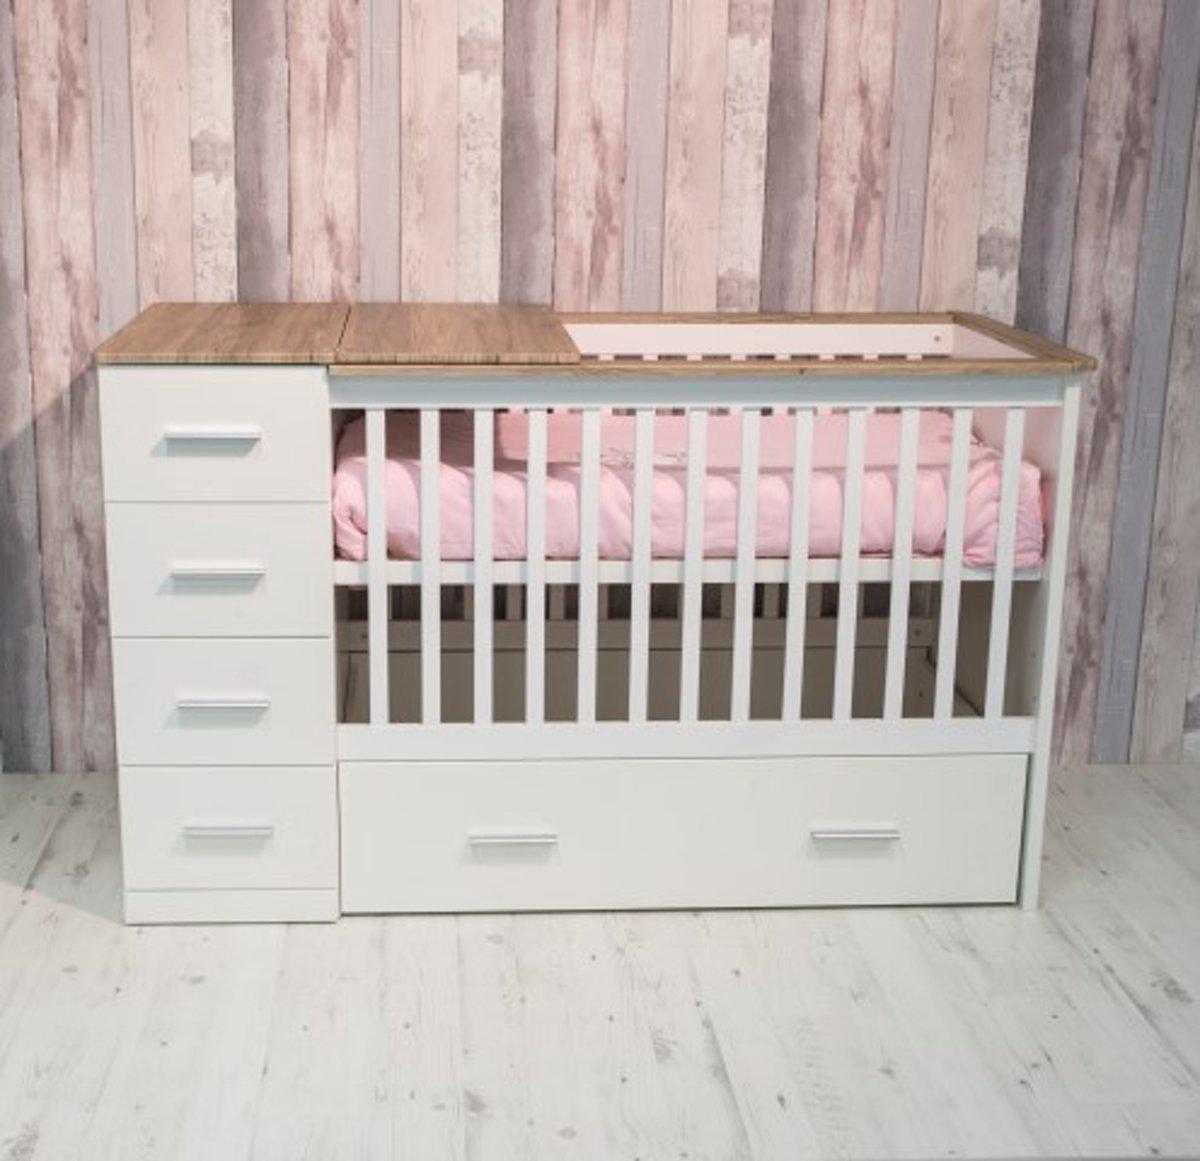 Babybed Met Kast.Bol Com Bebies First Sandy Ledikant 60x120 Cm Commode Wit Grijs